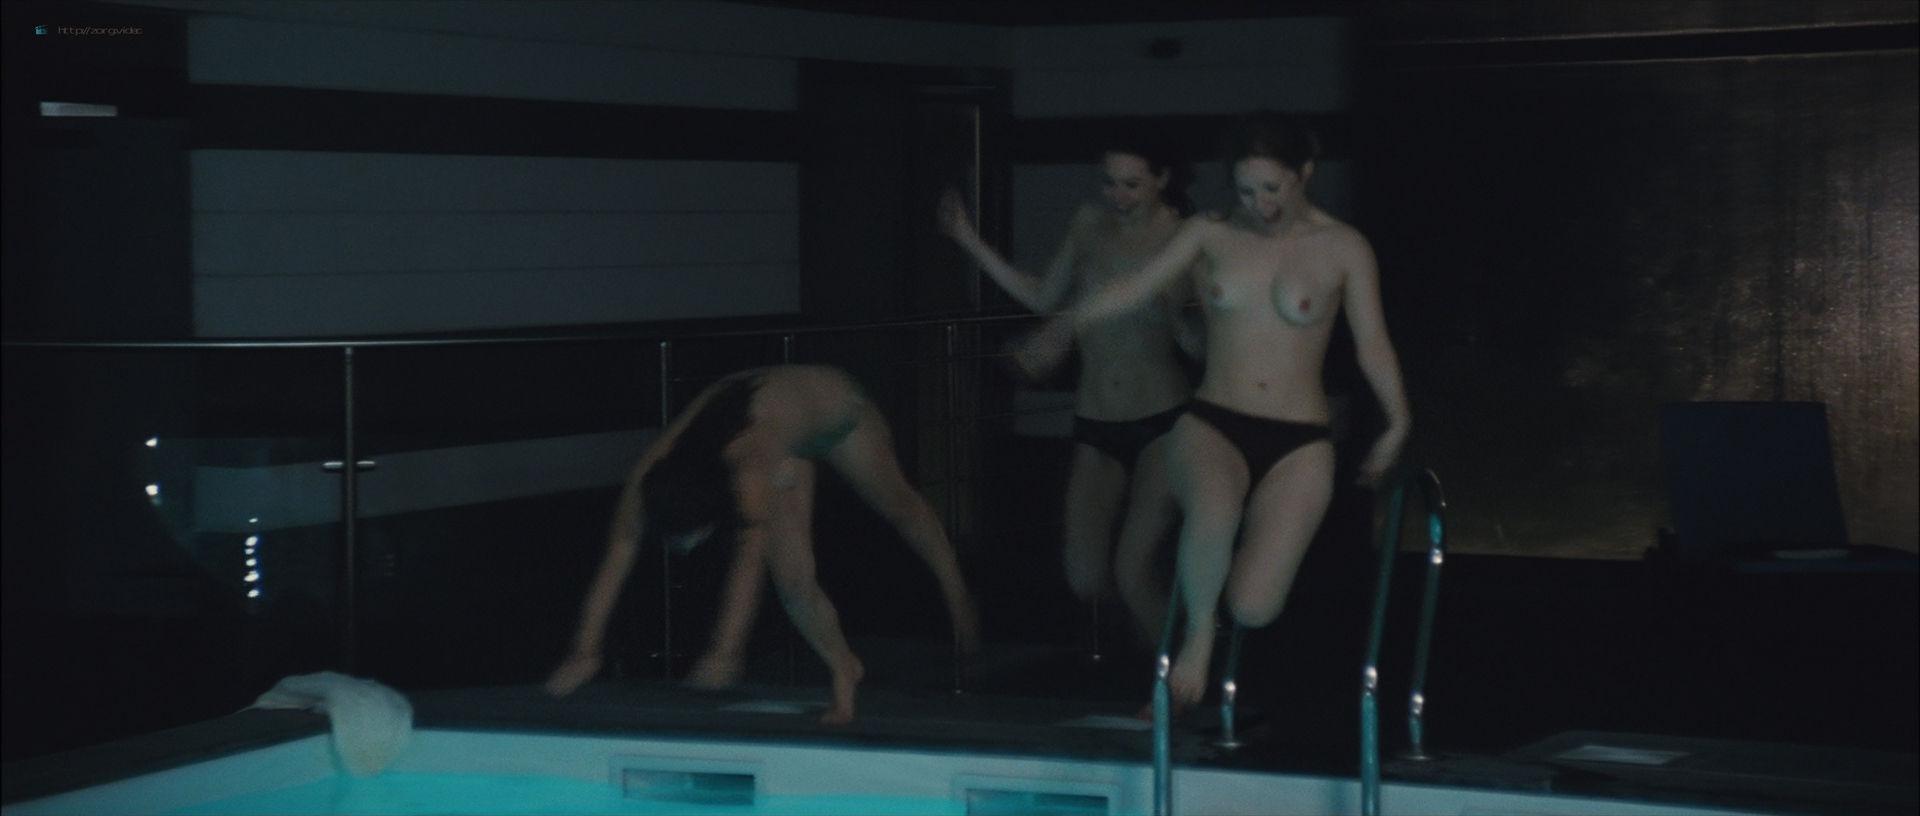 Camille Rowe nude and Josephine de La Baume nude sex threesome - Notre jour viendra (FR-2010) HD 1080p BluRay (17)